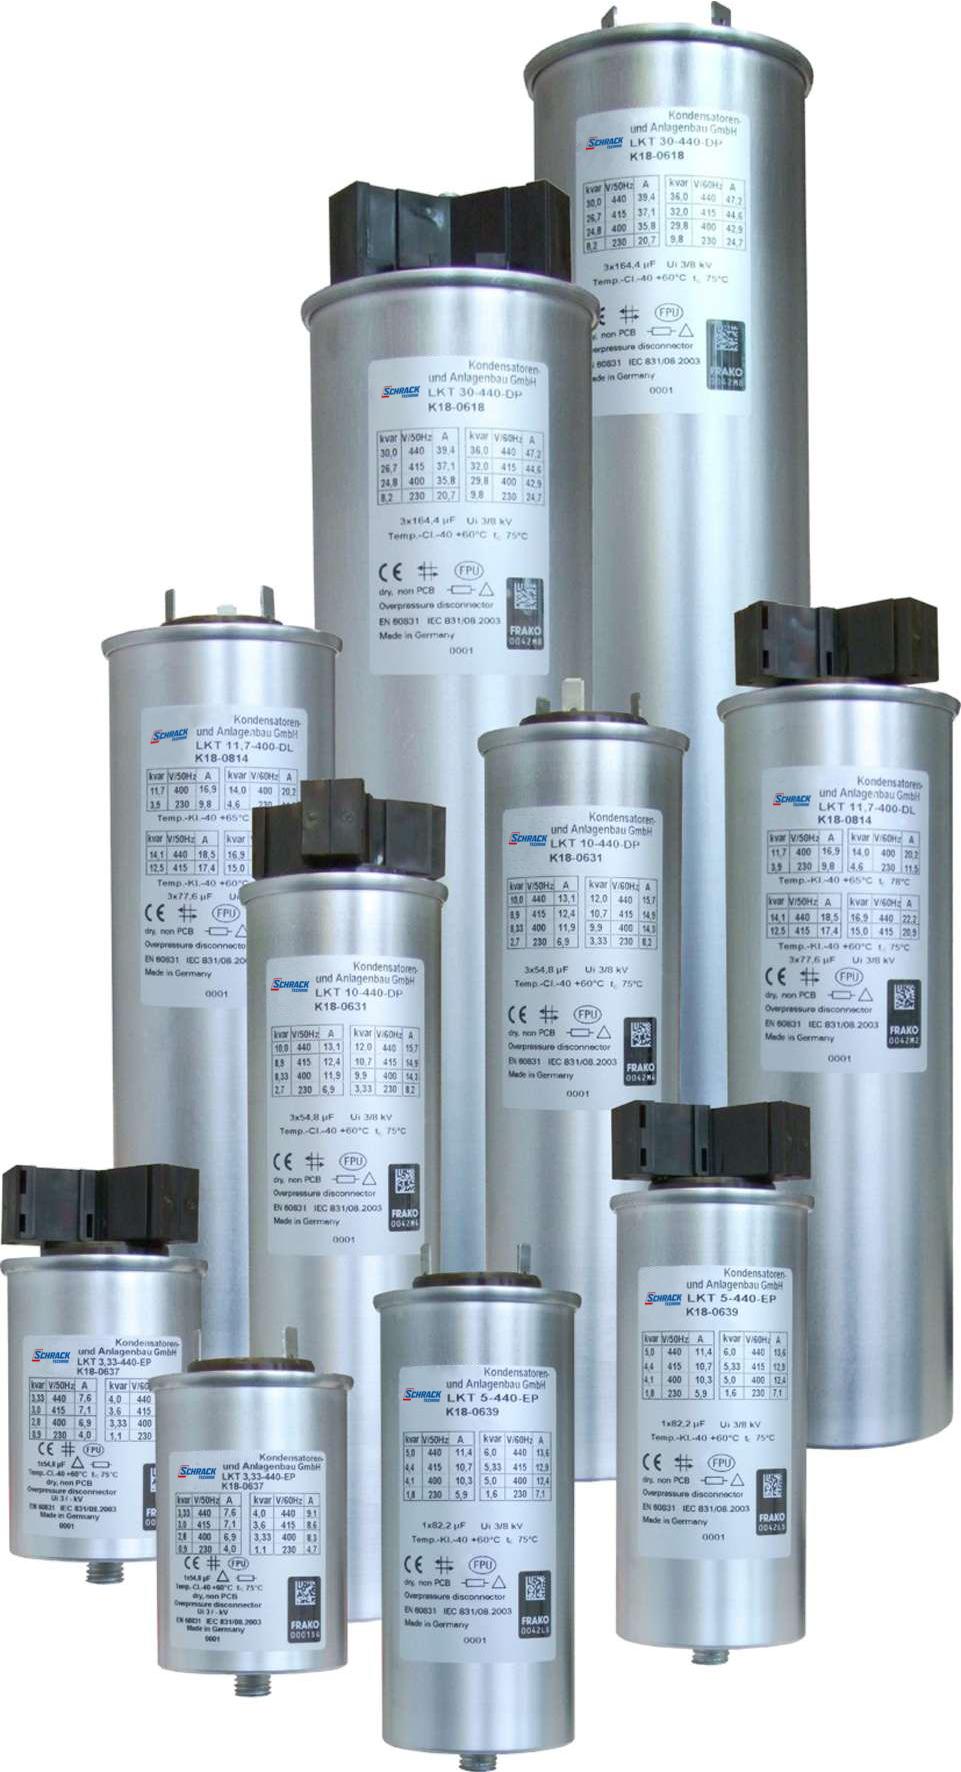 1 Stk Leistungskondensator 525V Qc=14,5kvar(400V)Qc=17,6kvar(440V) FRLK25052B